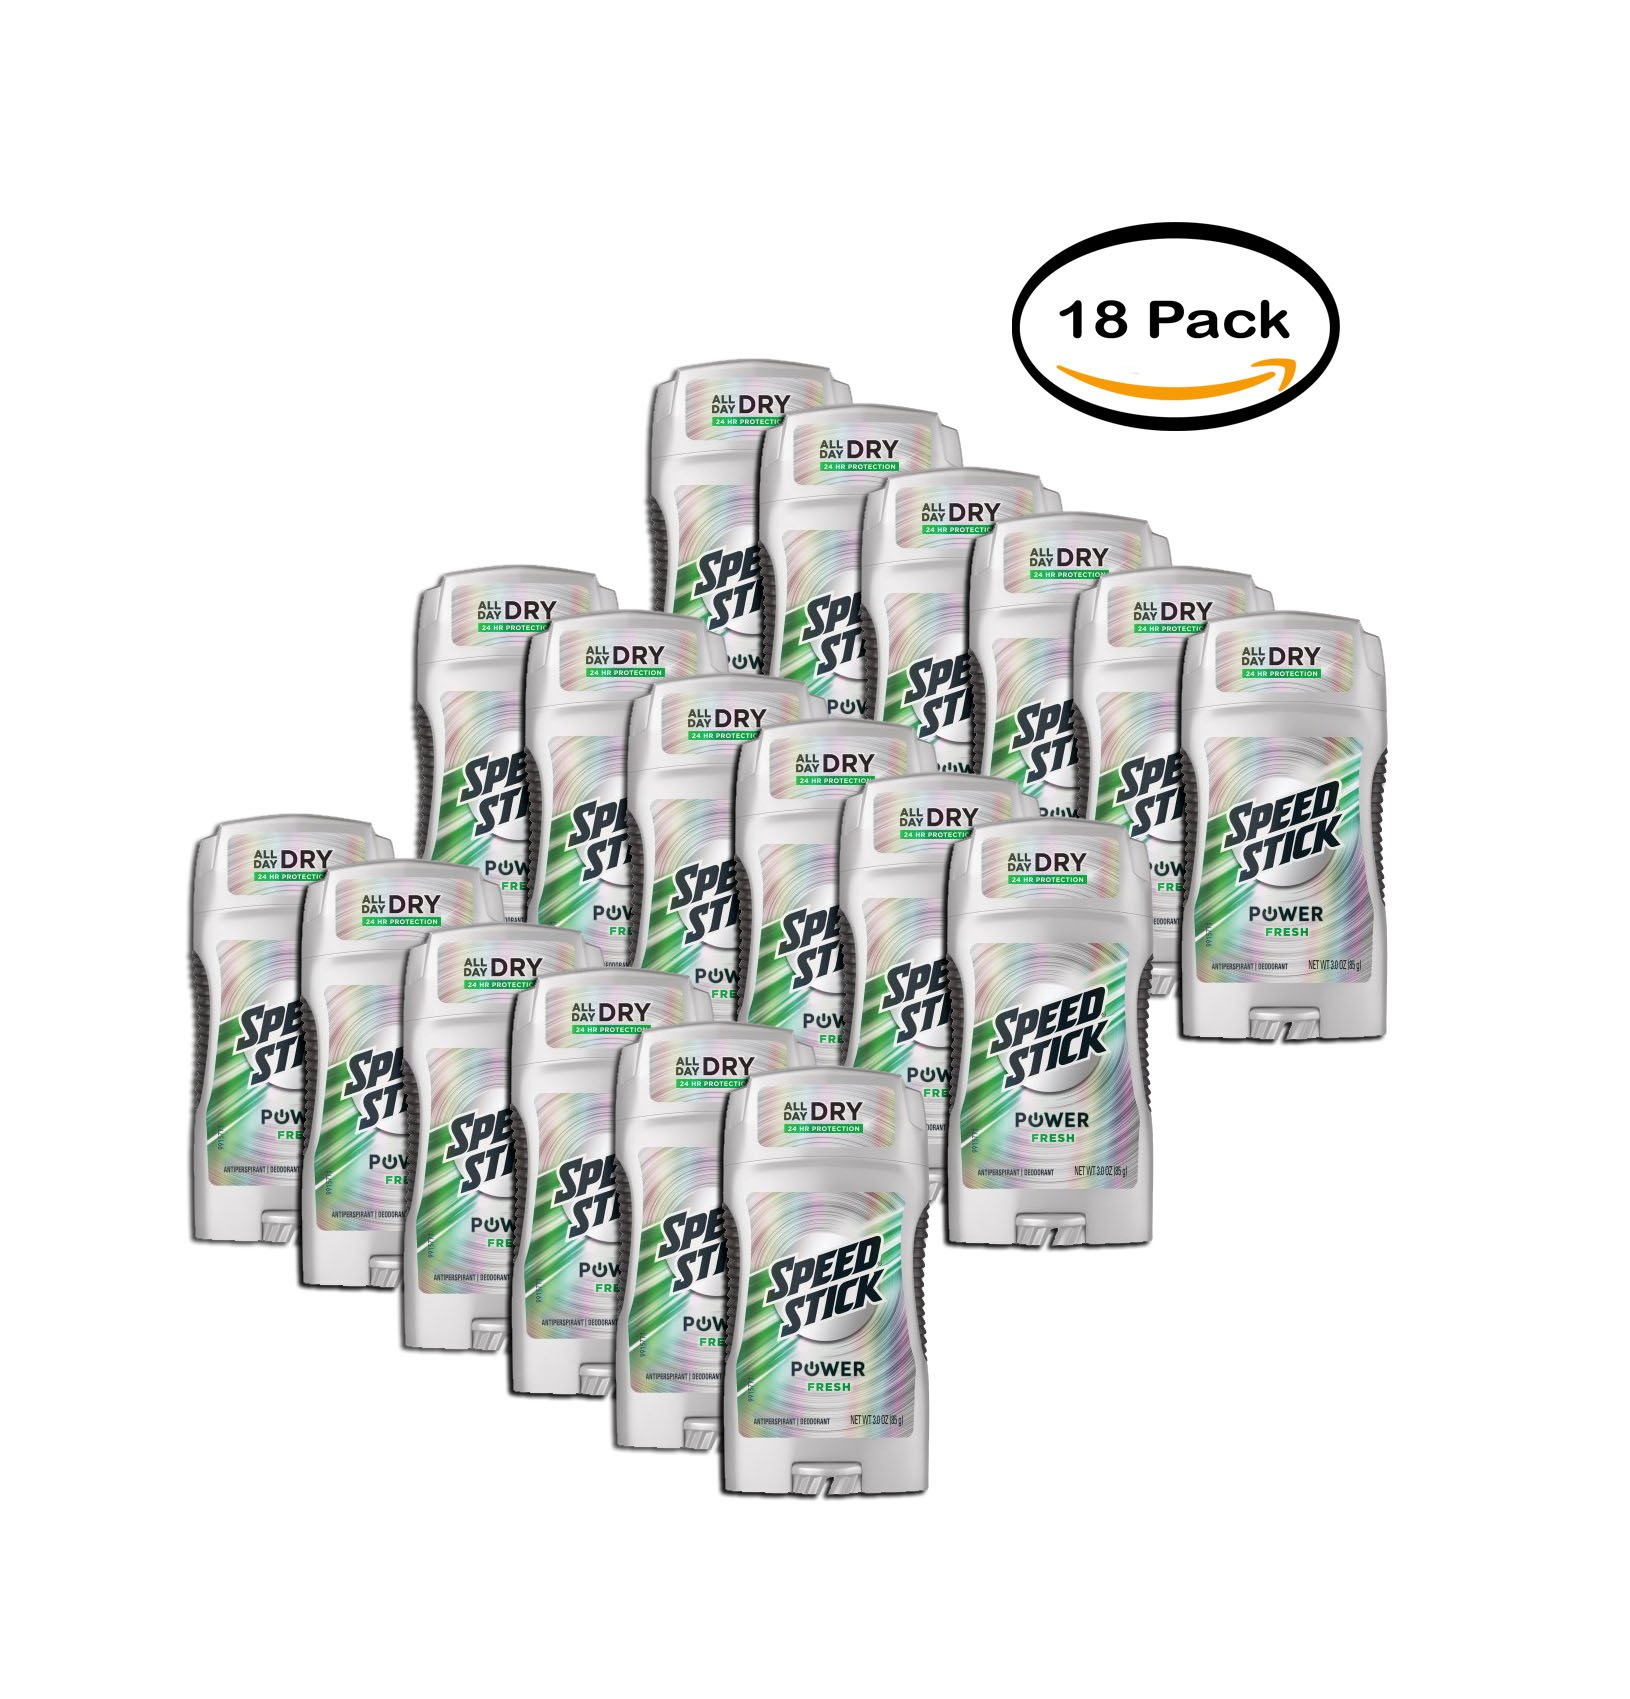 PACK OF 18 - Speed Stick Antiperspirant/Deodorant Power Fresh, 3.0z